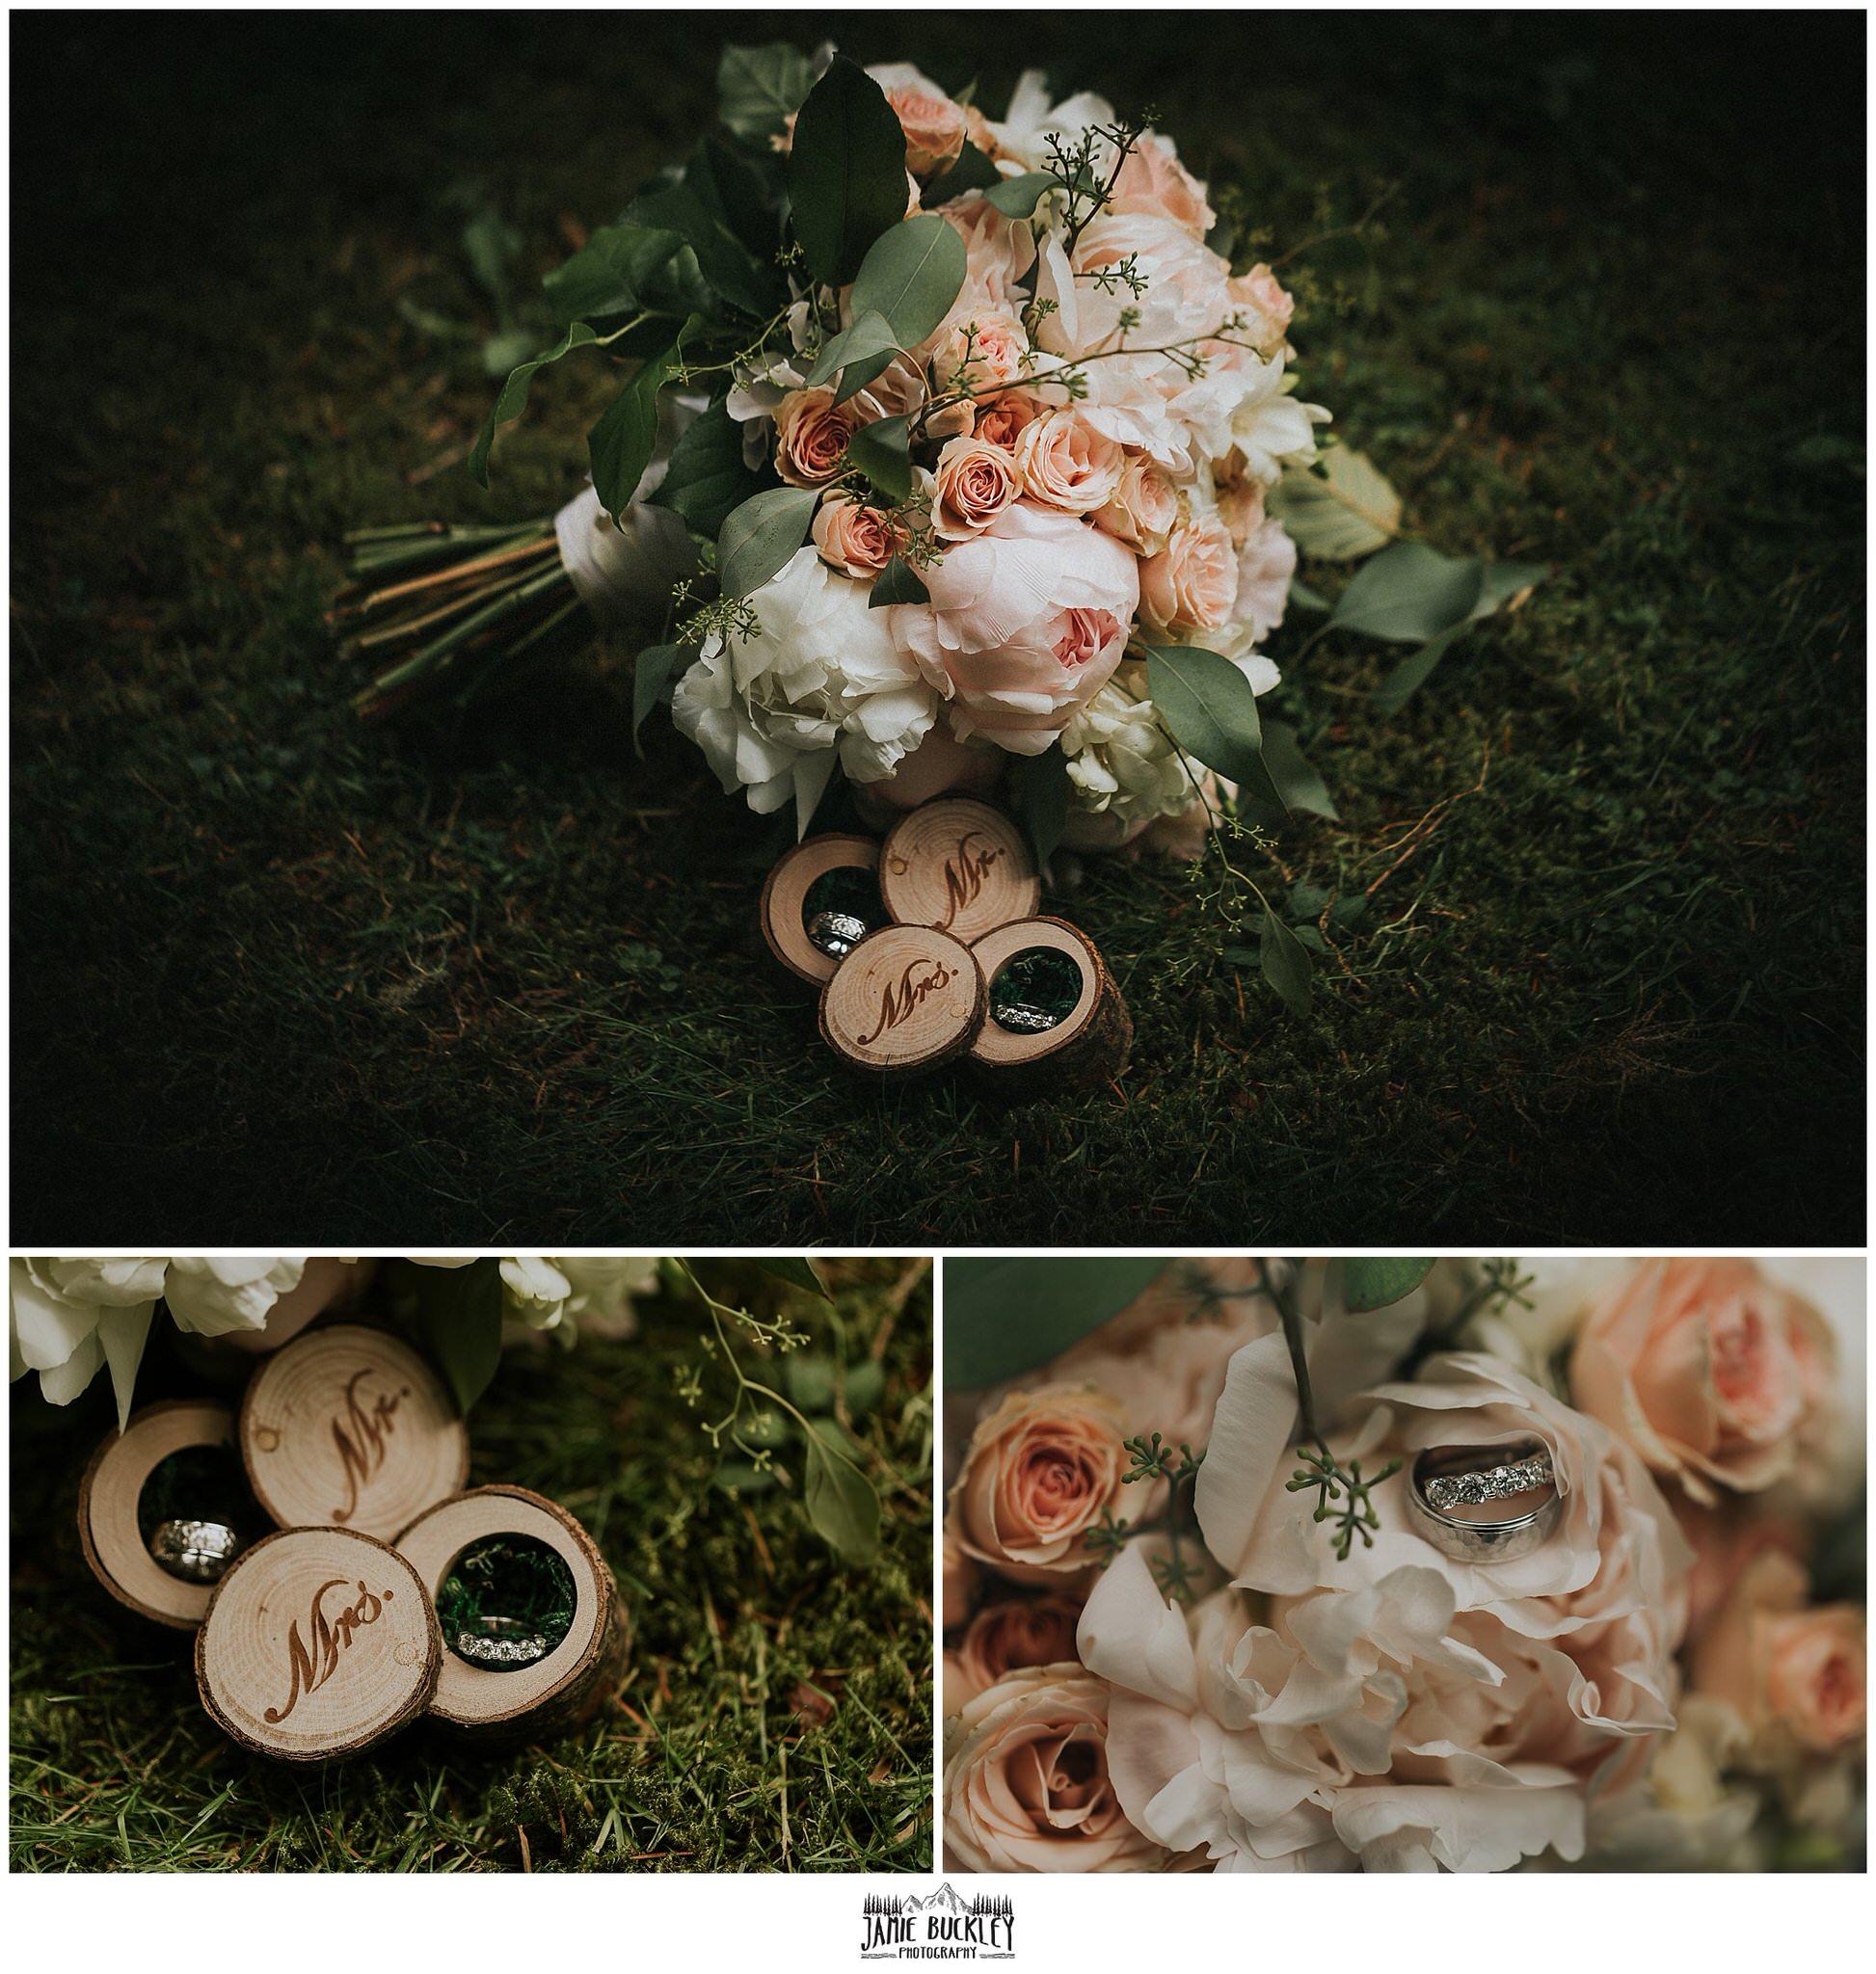 wedding bouquet detail shots